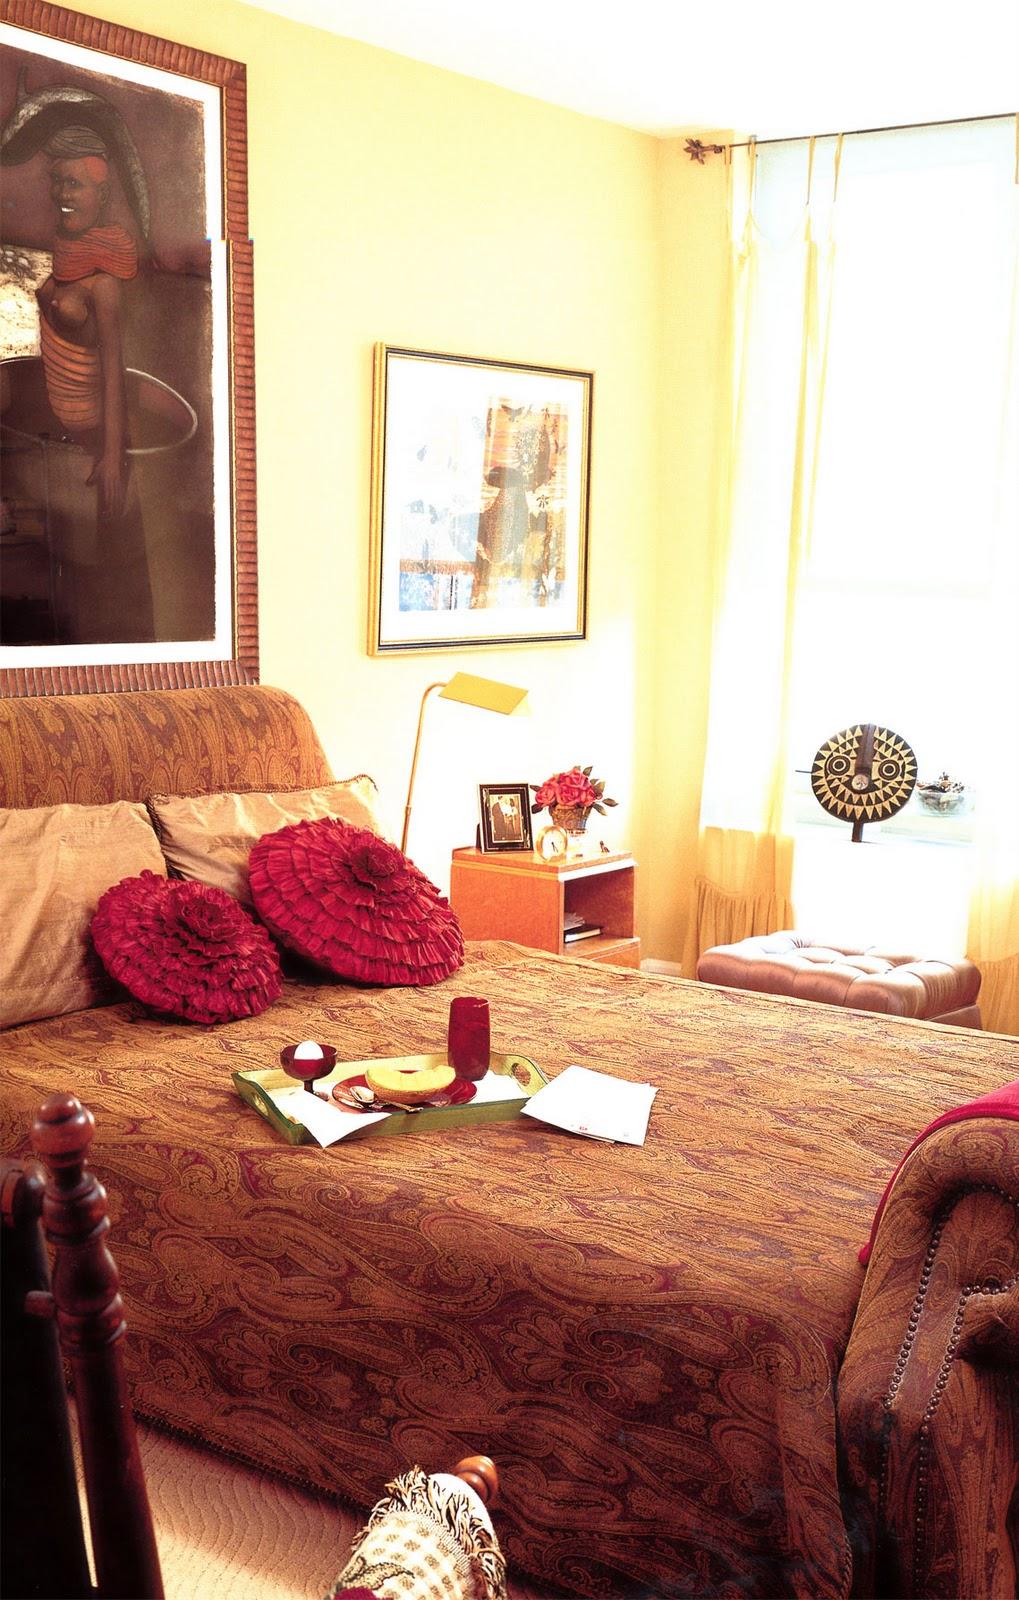 apartmentf15 decorating with african masks 2. Black Bedroom Furniture Sets. Home Design Ideas